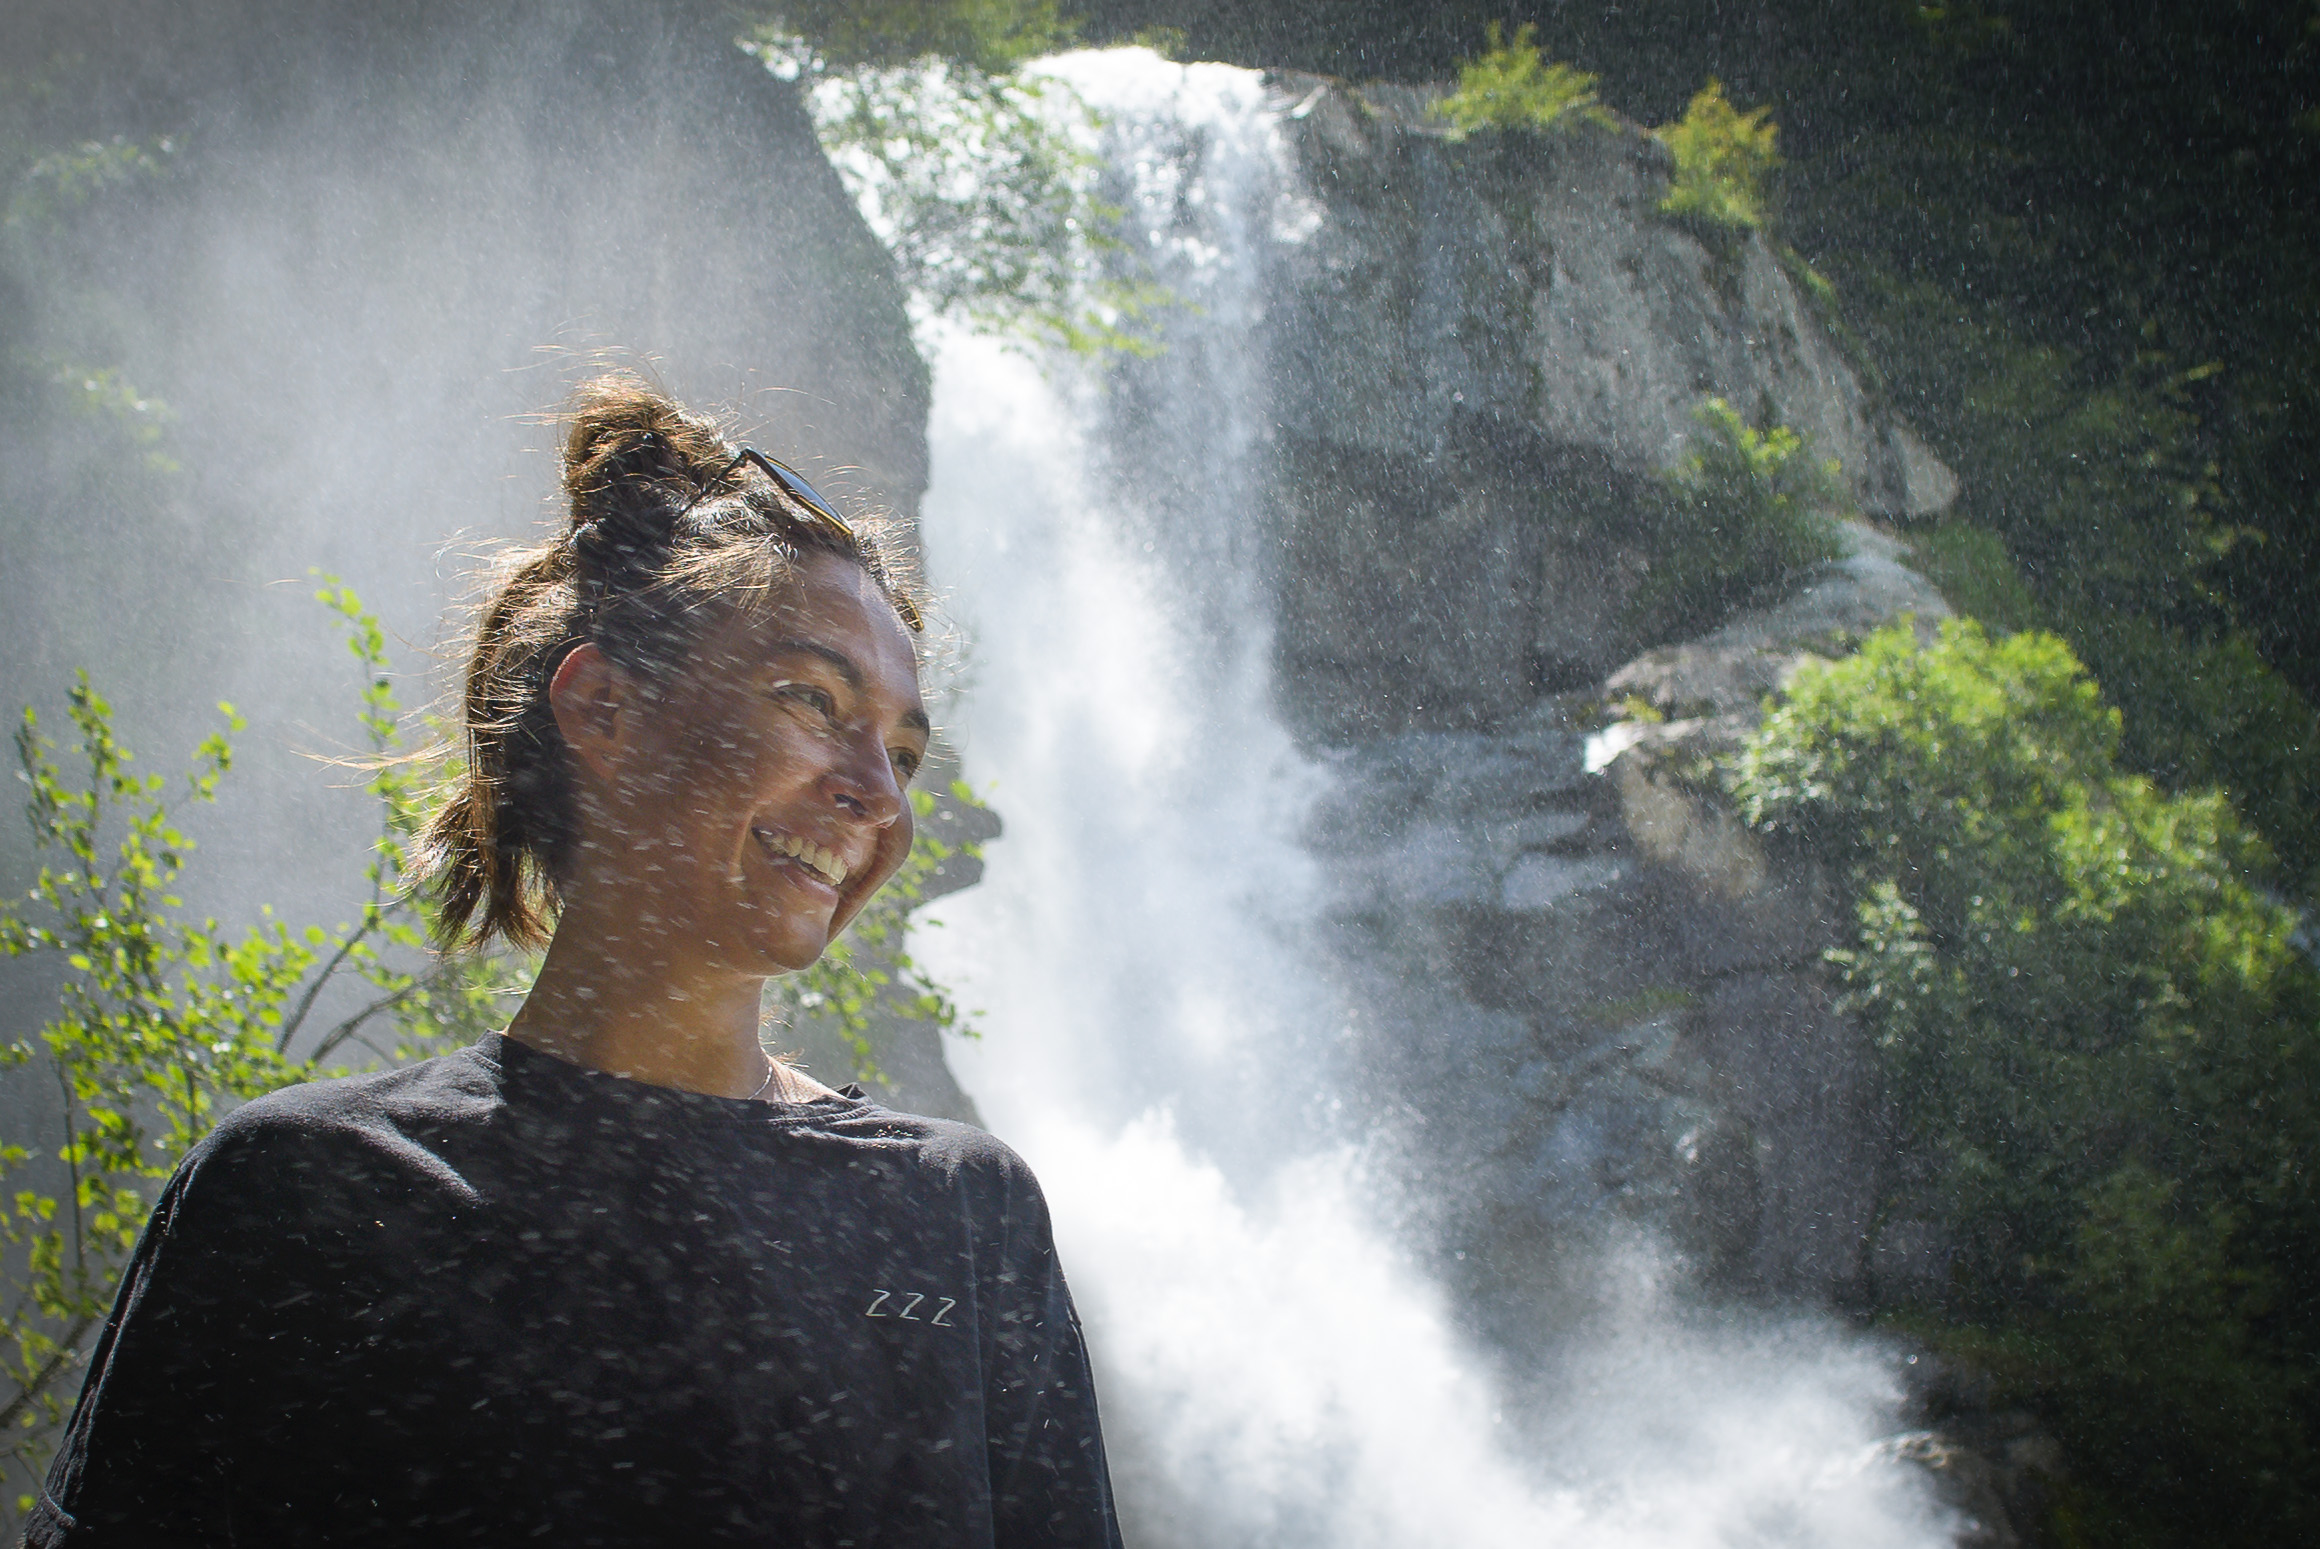 Ire - low lares waterfalls...